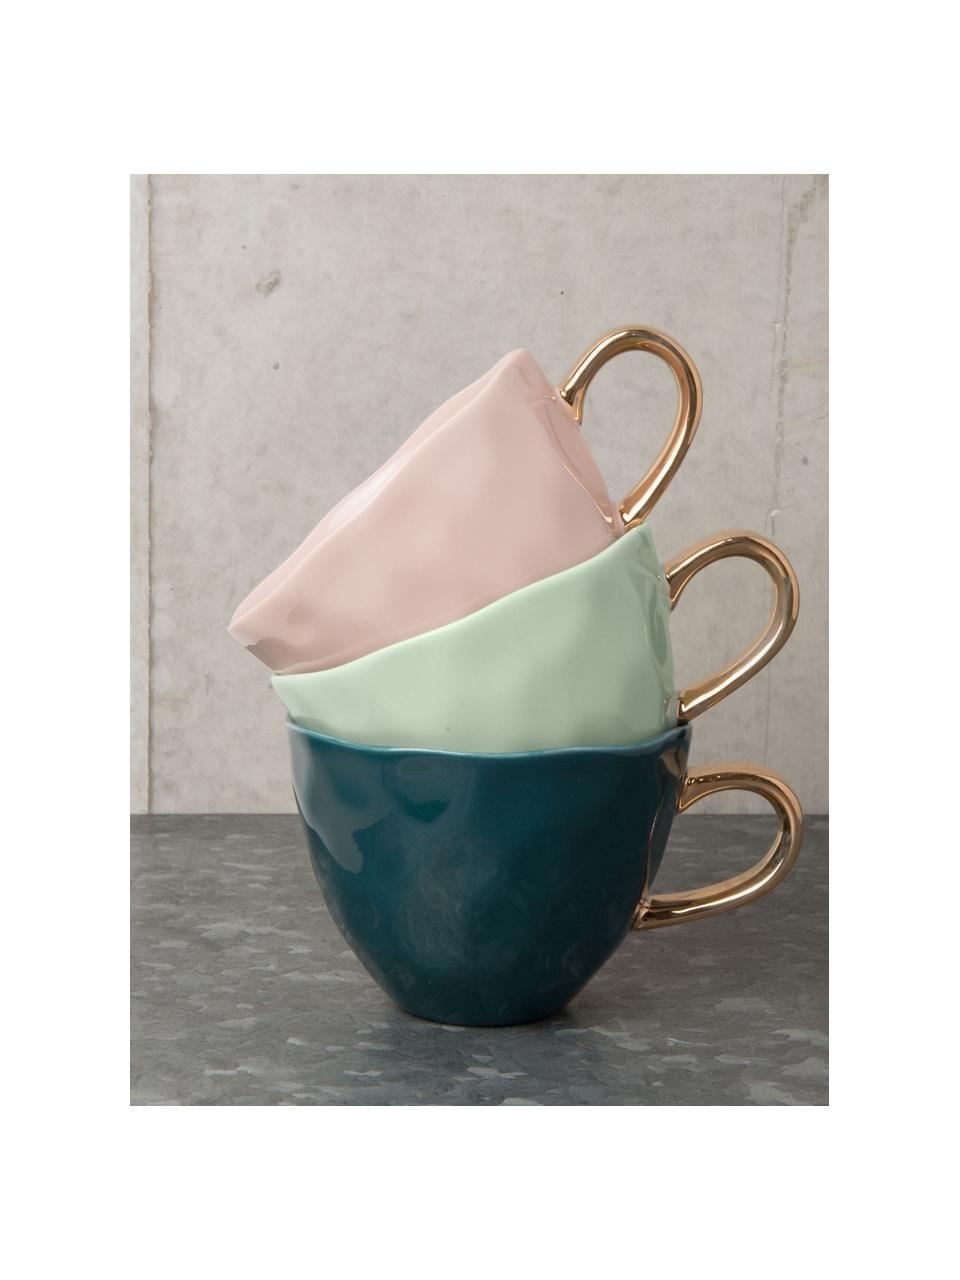 Tasse Good Morning in Mint mit goldfarbenem Griff, Steingut, Mintgrün, Goldfarben, Ø 11 x H 8 cm